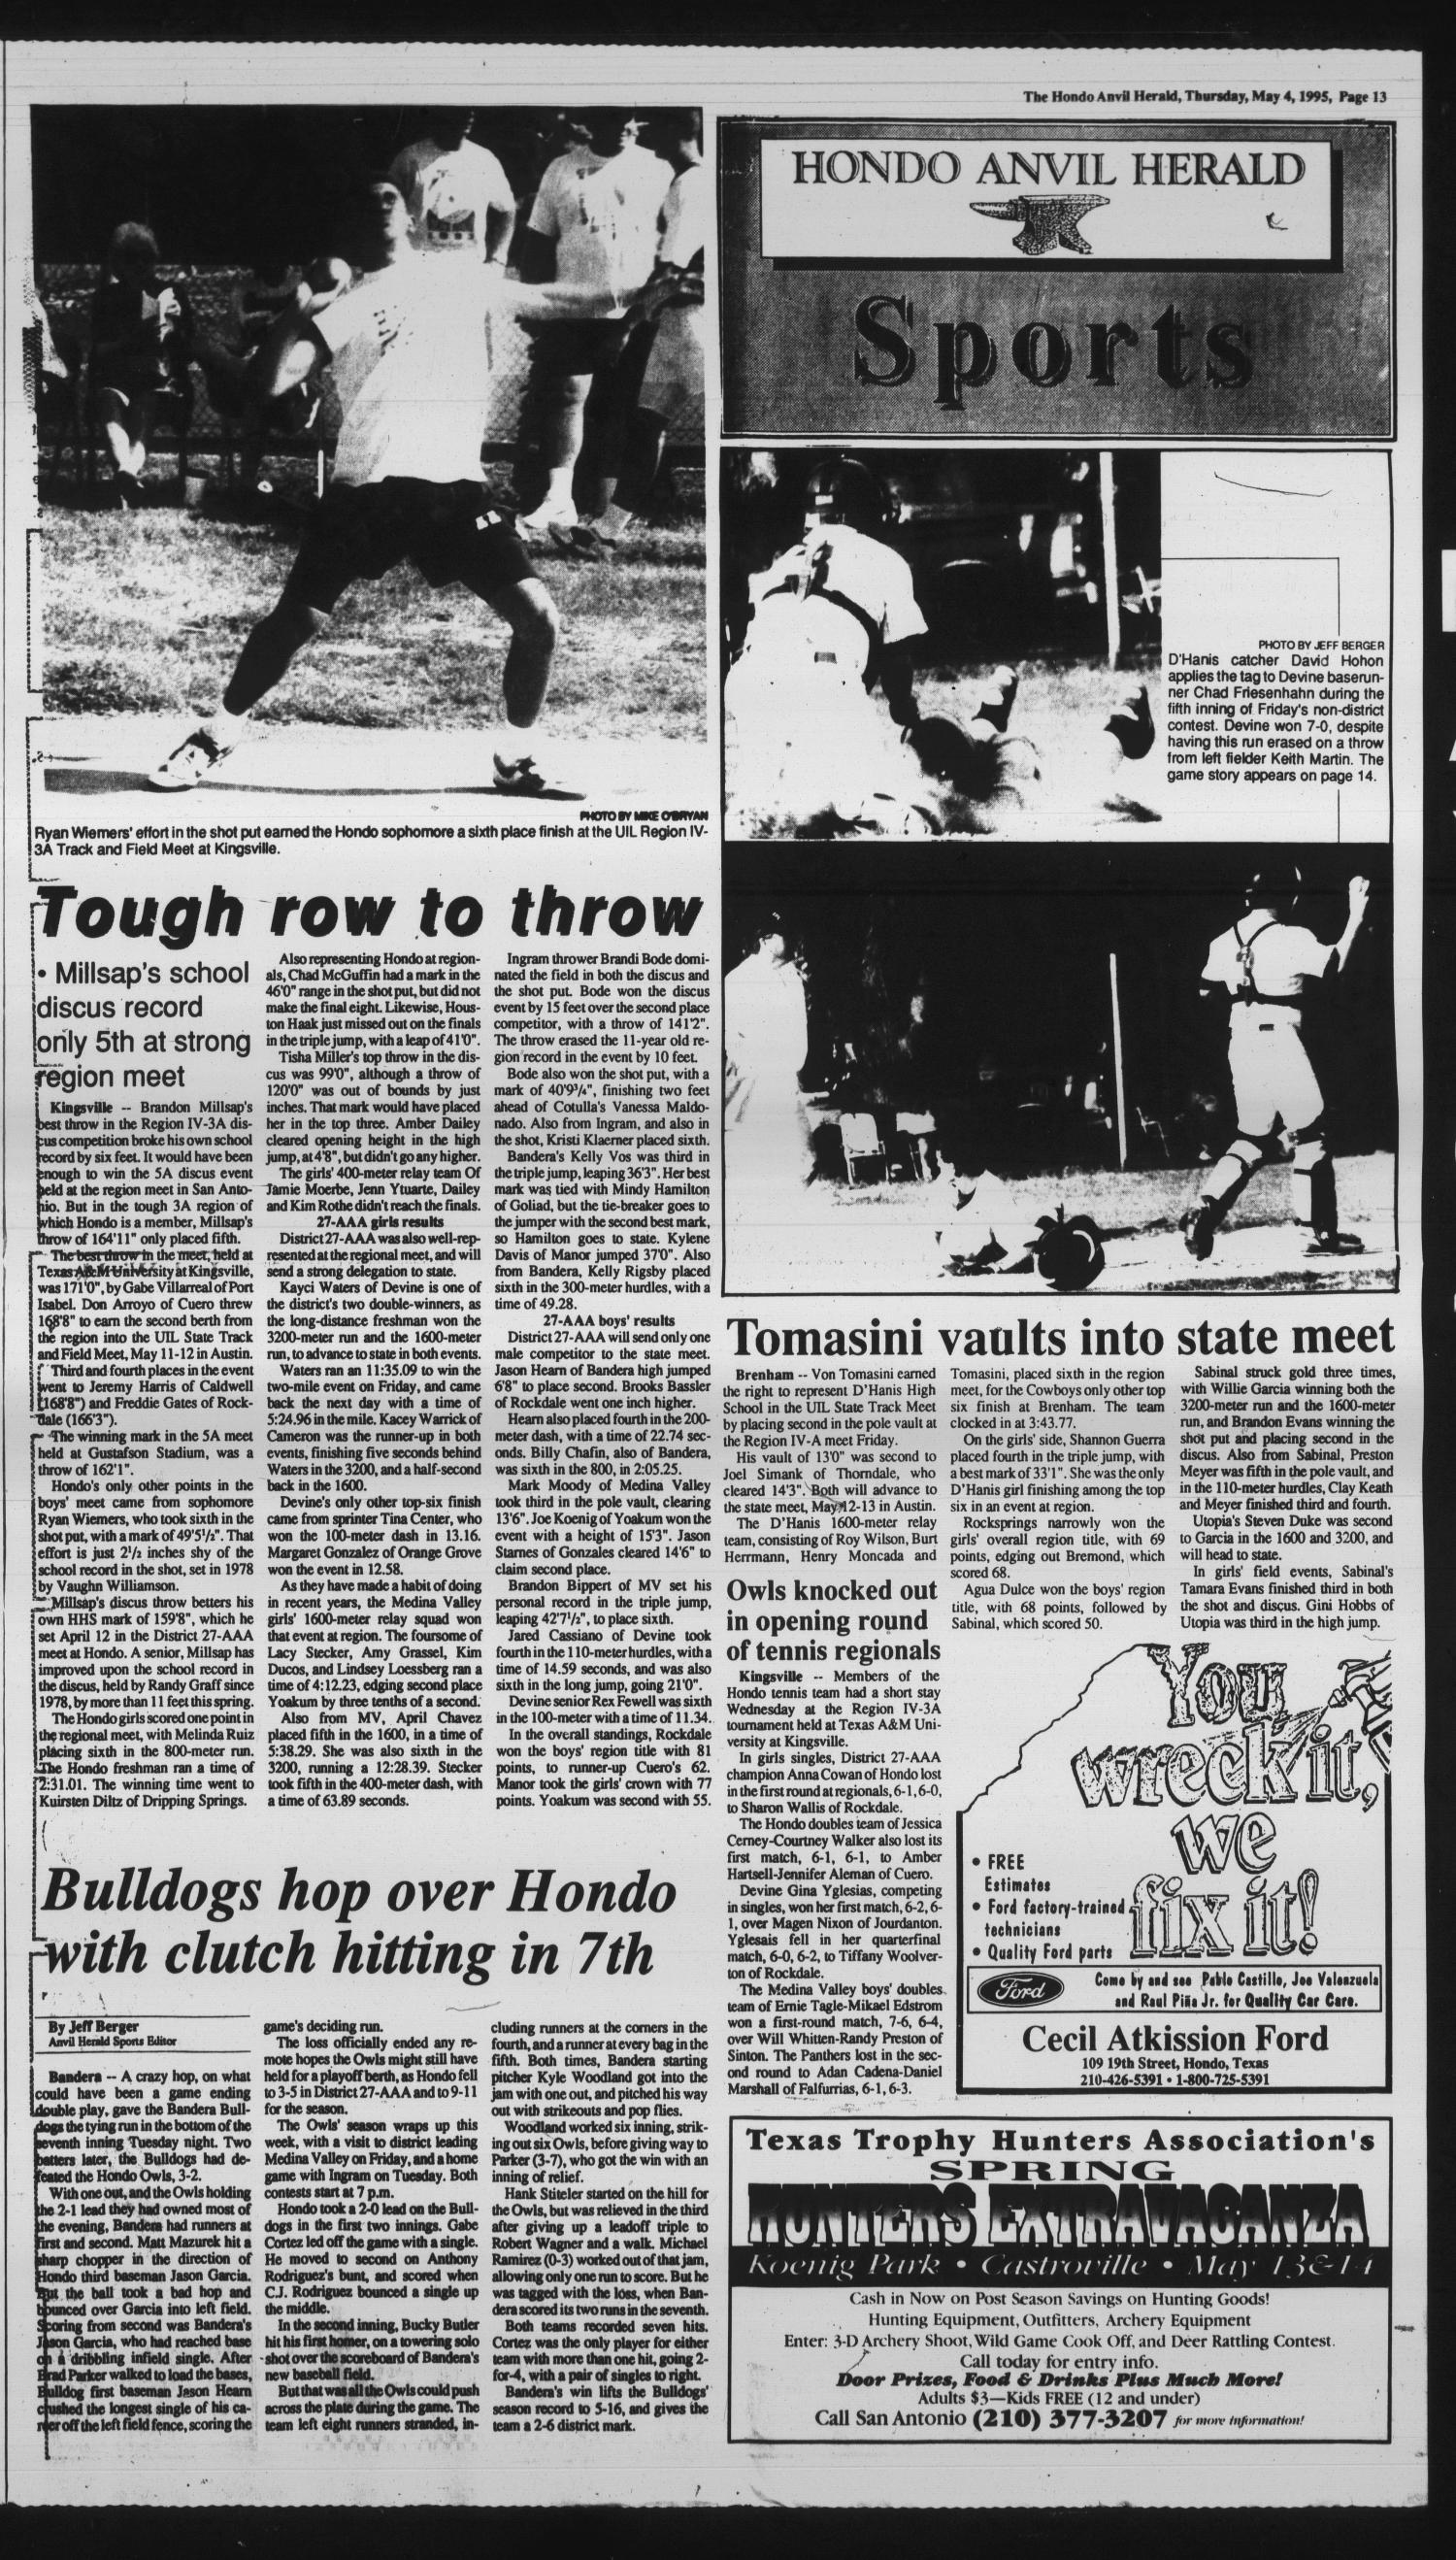 Hondo Anvil Herald (Hondo, Tex ), Vol  109, No  18, Ed  1